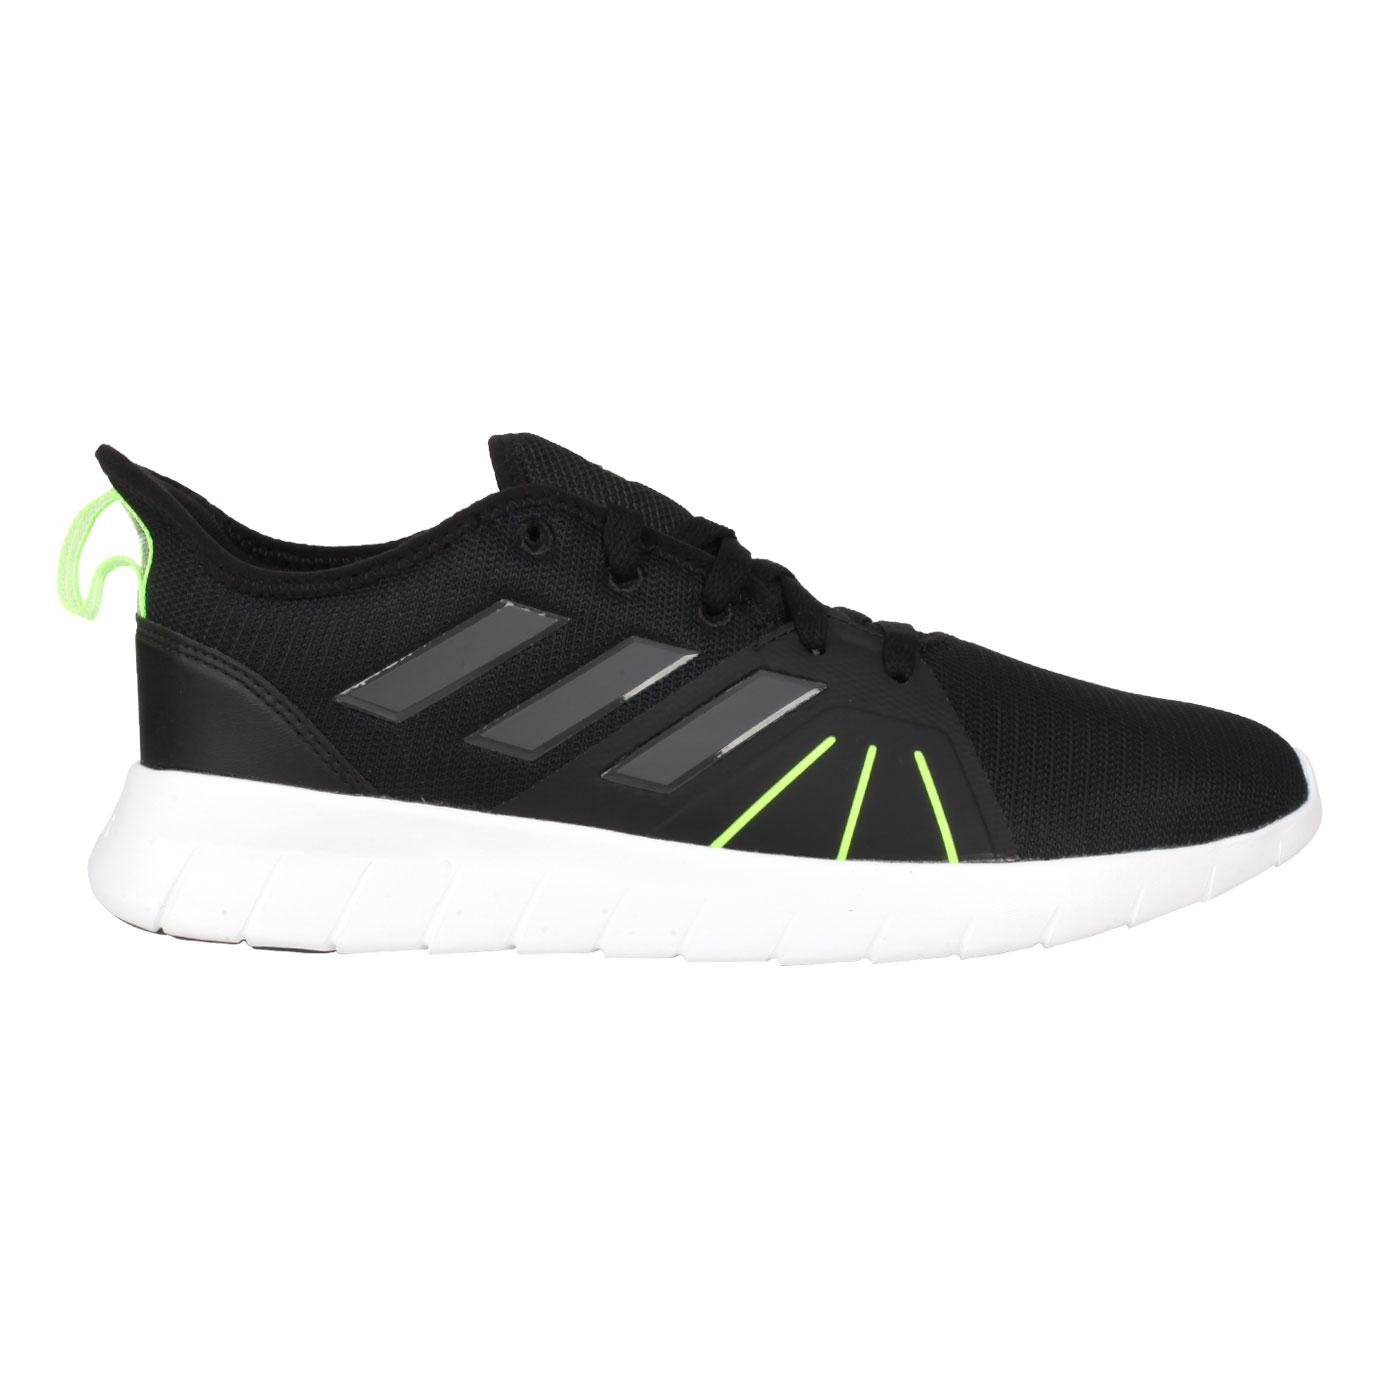 ADIDAS 男款運動慢跑鞋  @ASWEERUN 2.0@FW1683